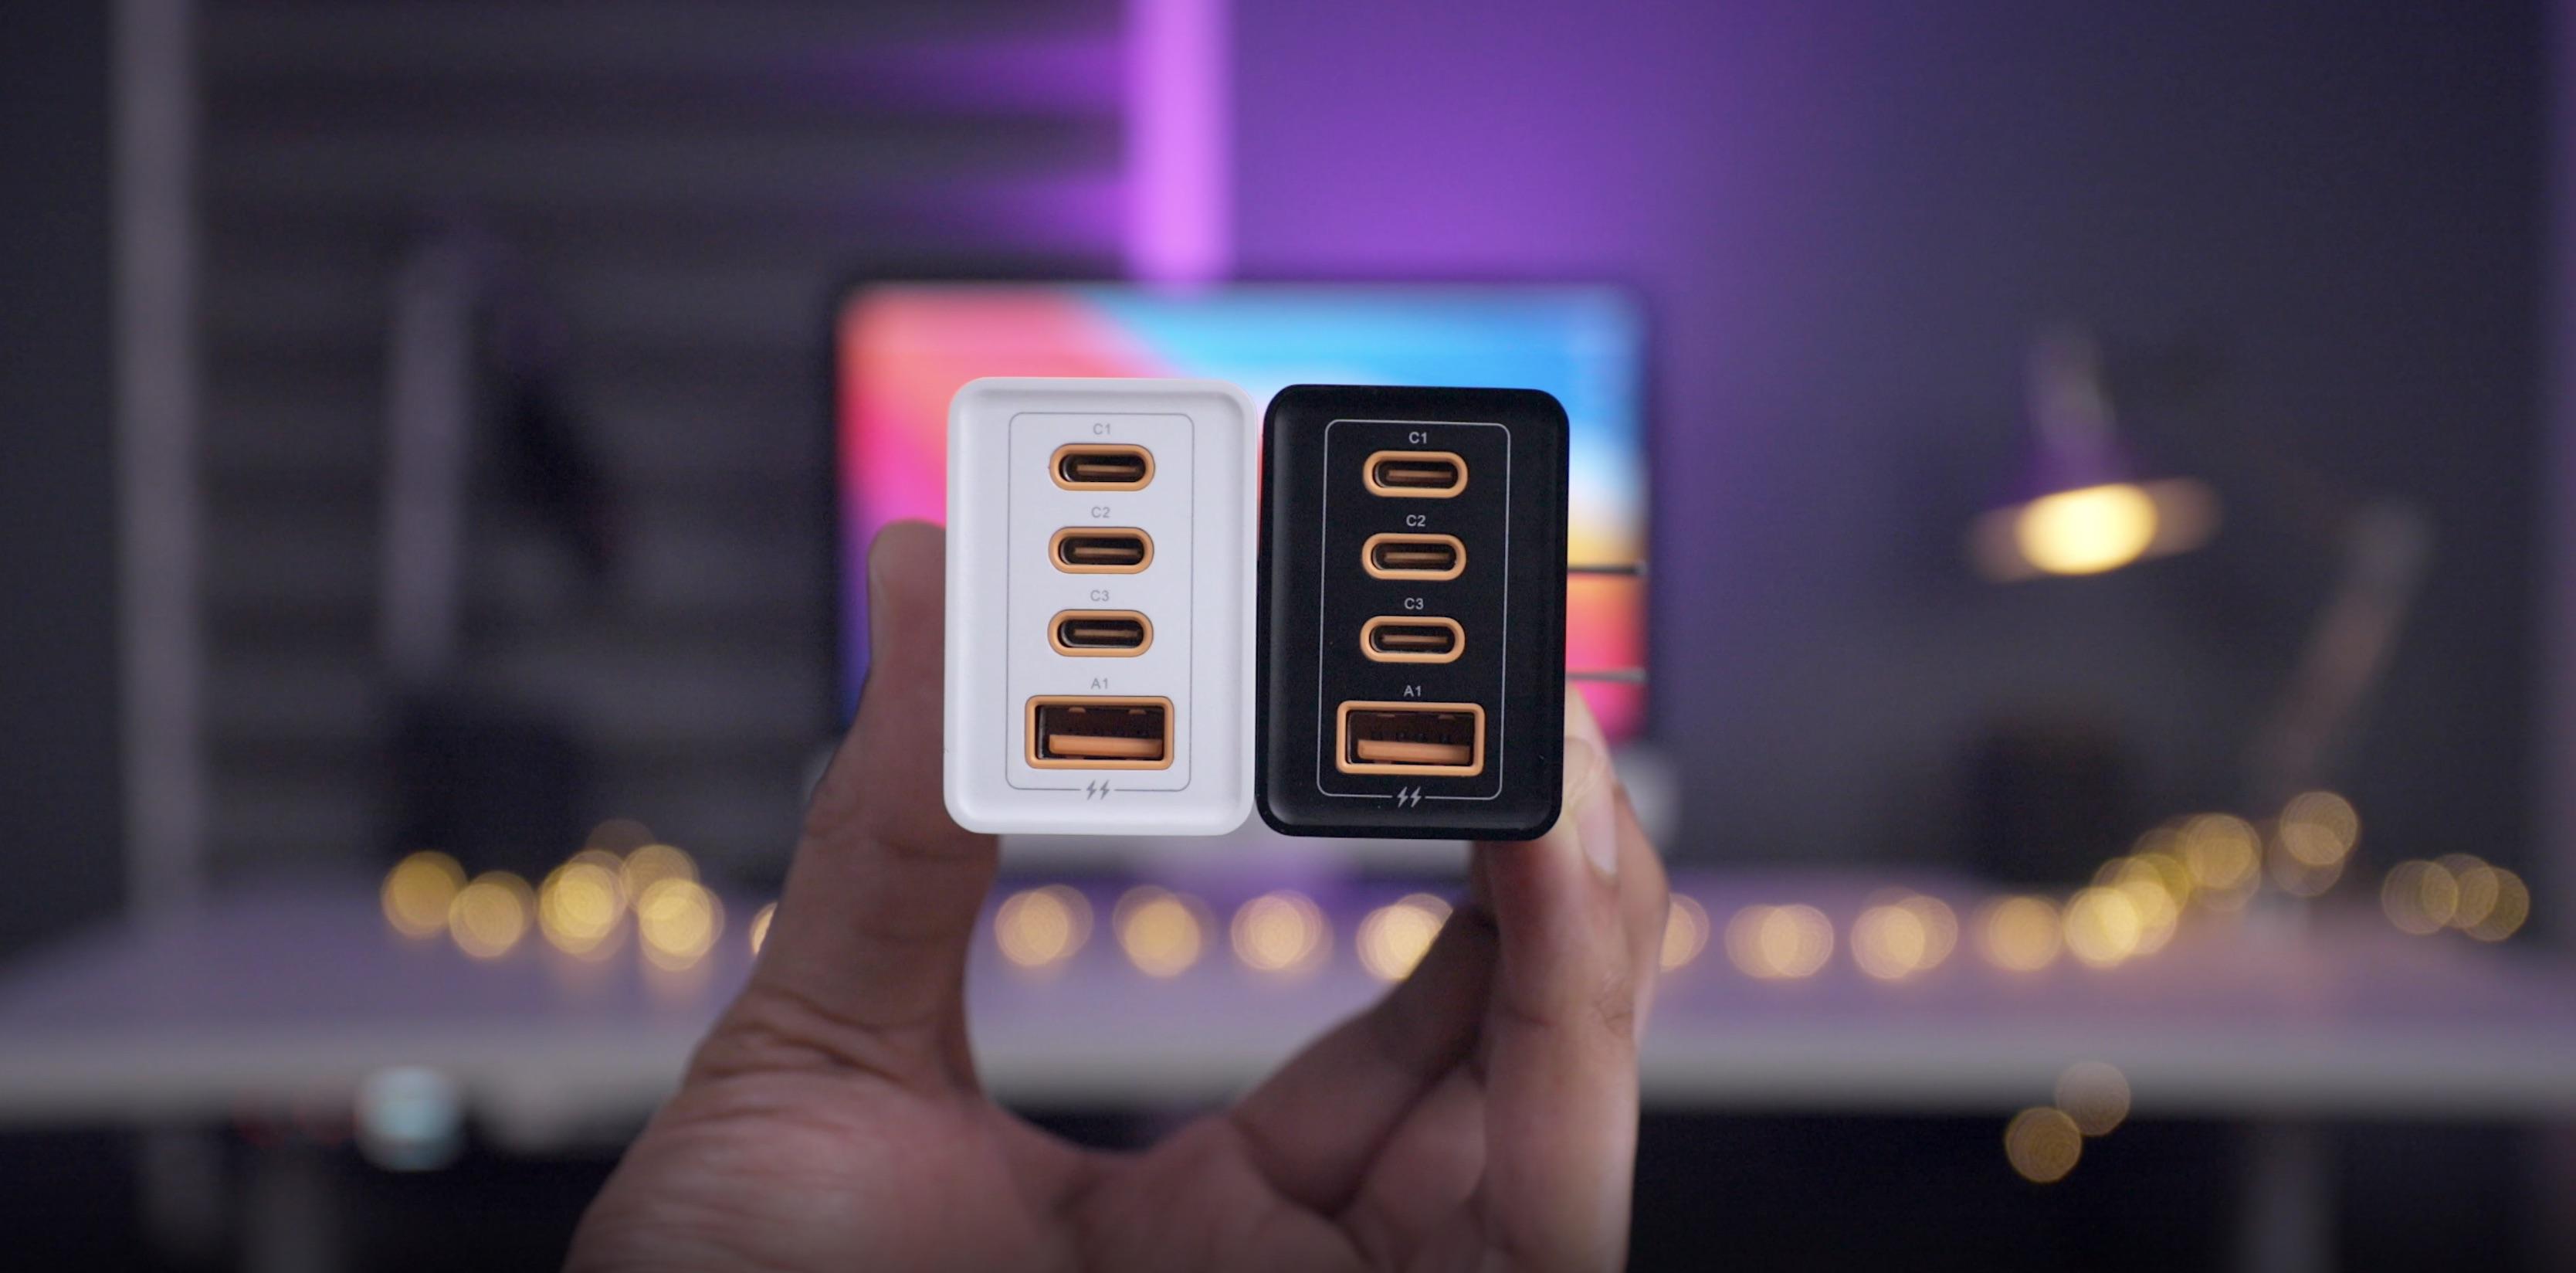 HyperJuice GaN Stackable Charger USB-C